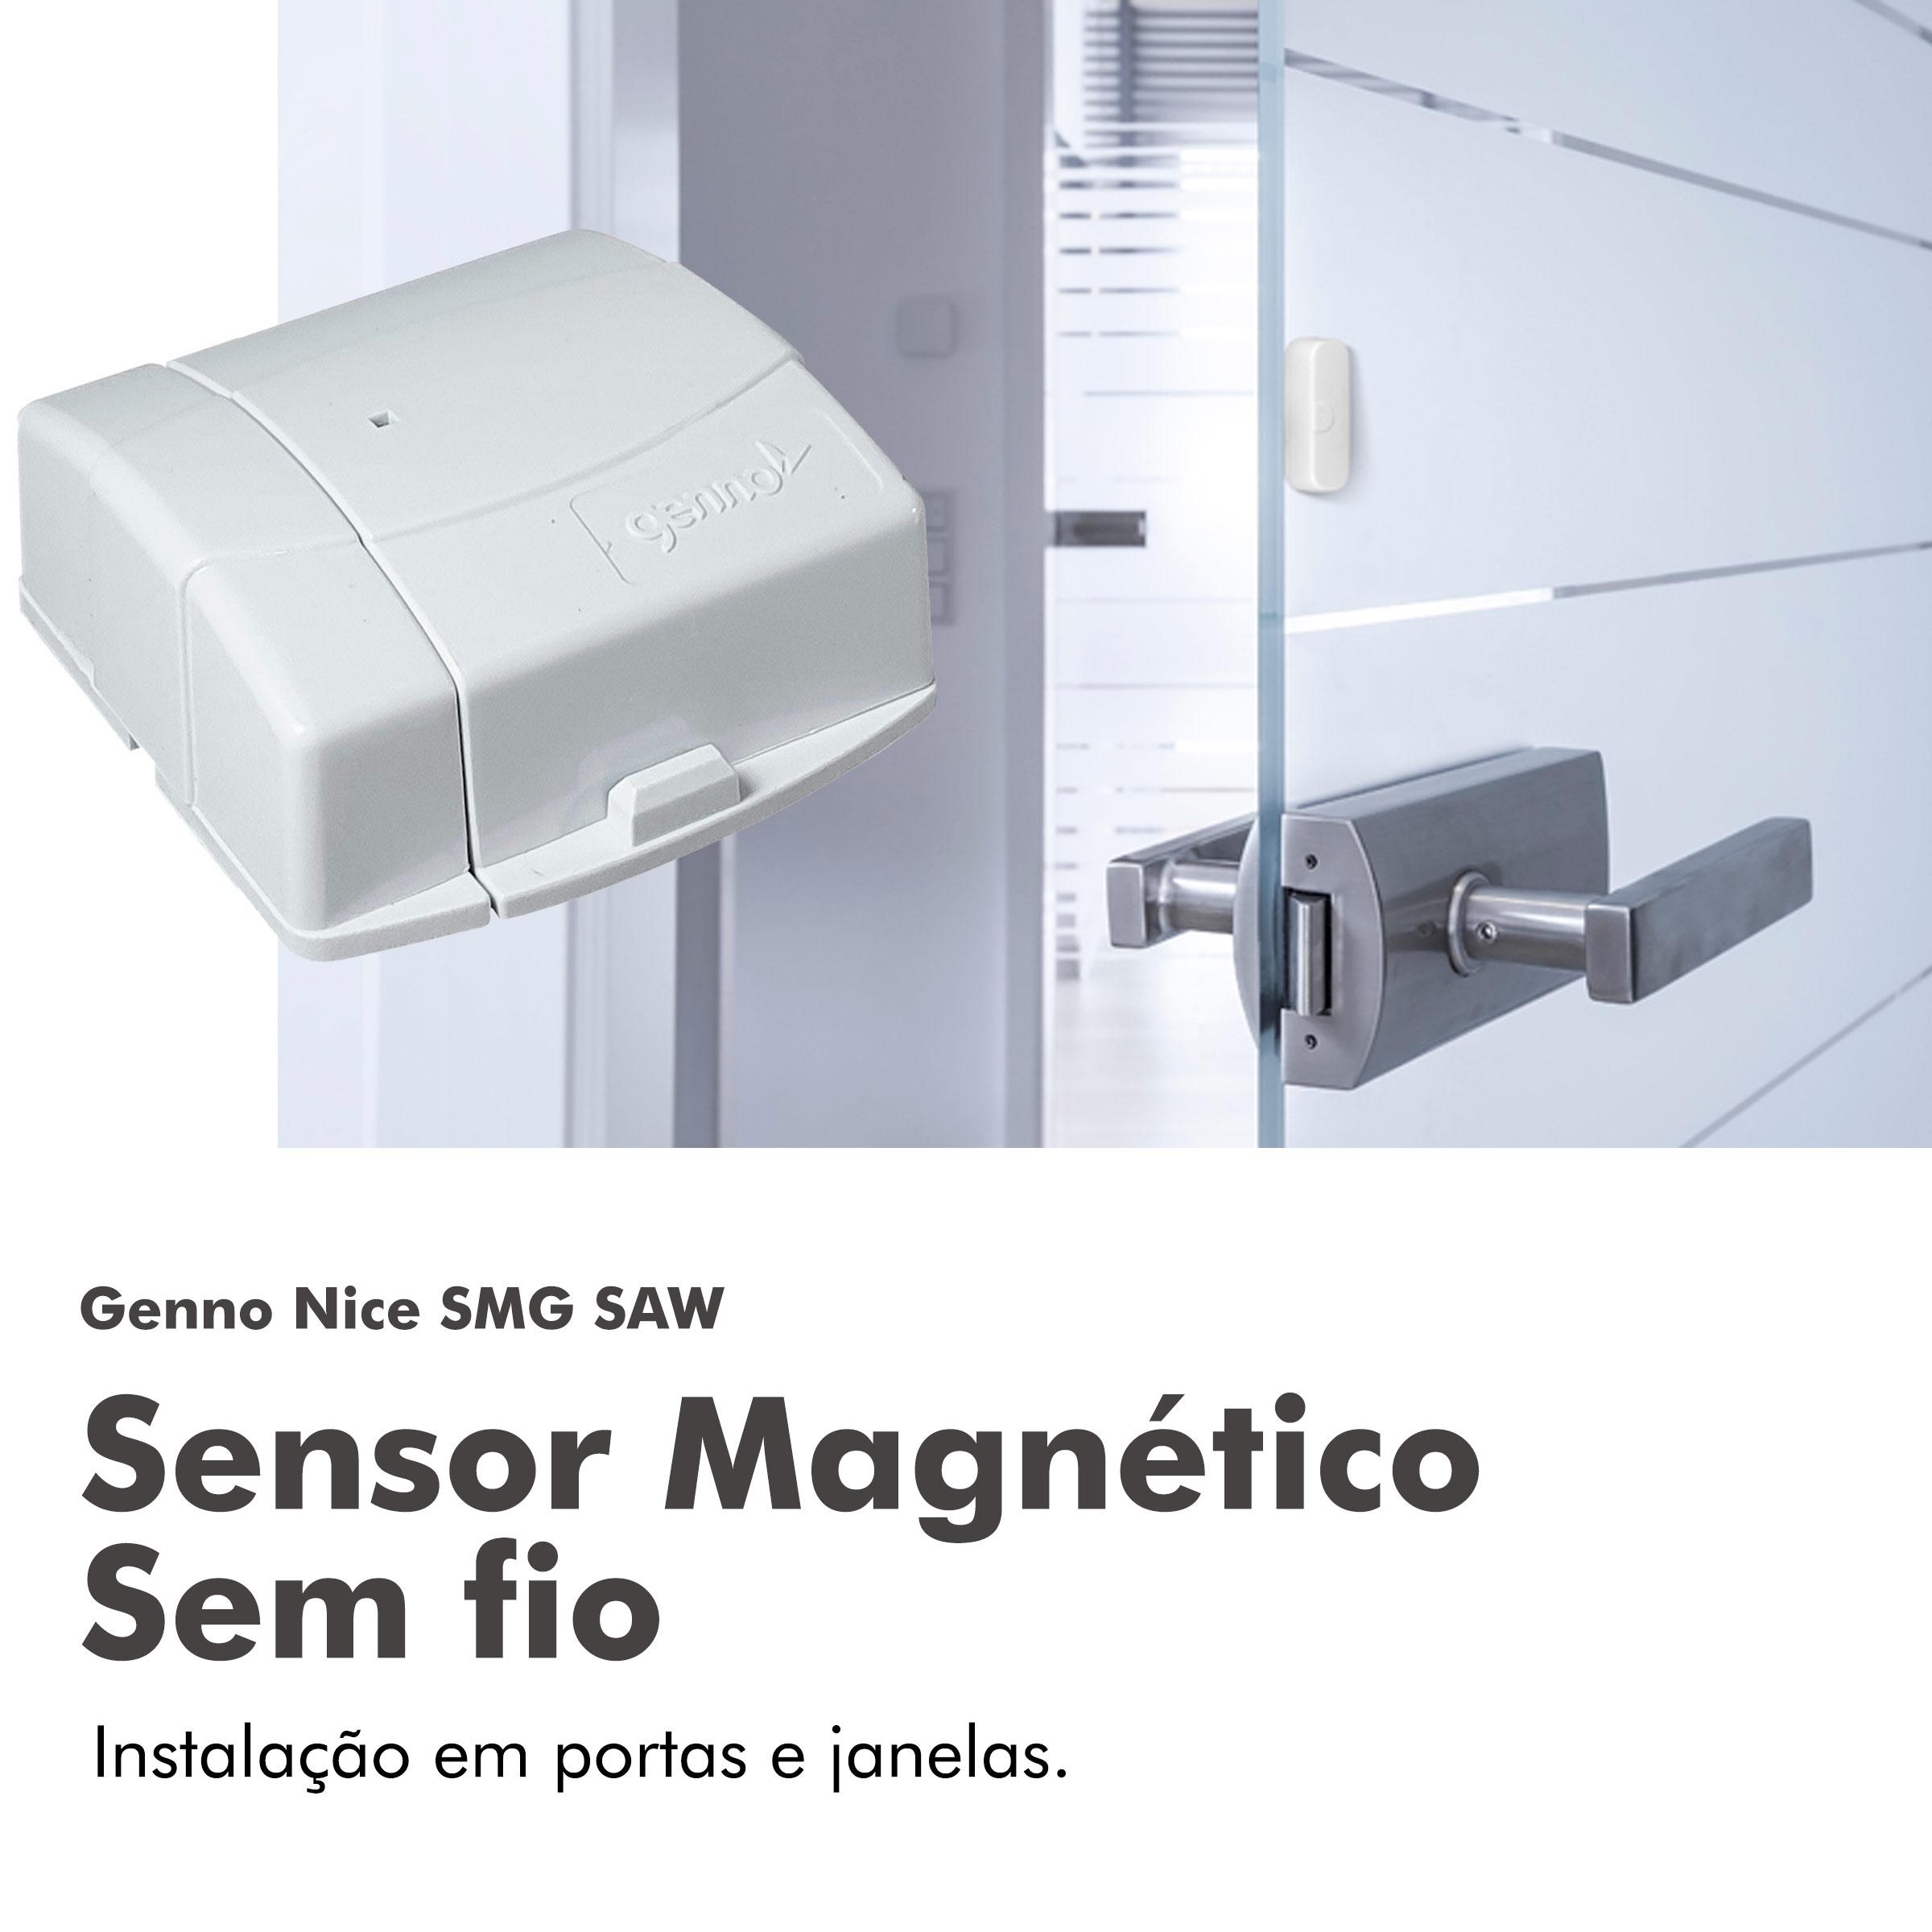 kit-3-cameras-de-seguranca-full-hd-intelbras-vhd-1220-b-g6-dvr-intelbras-04-canais-full-hd-mhdx-3104-acessorios-02